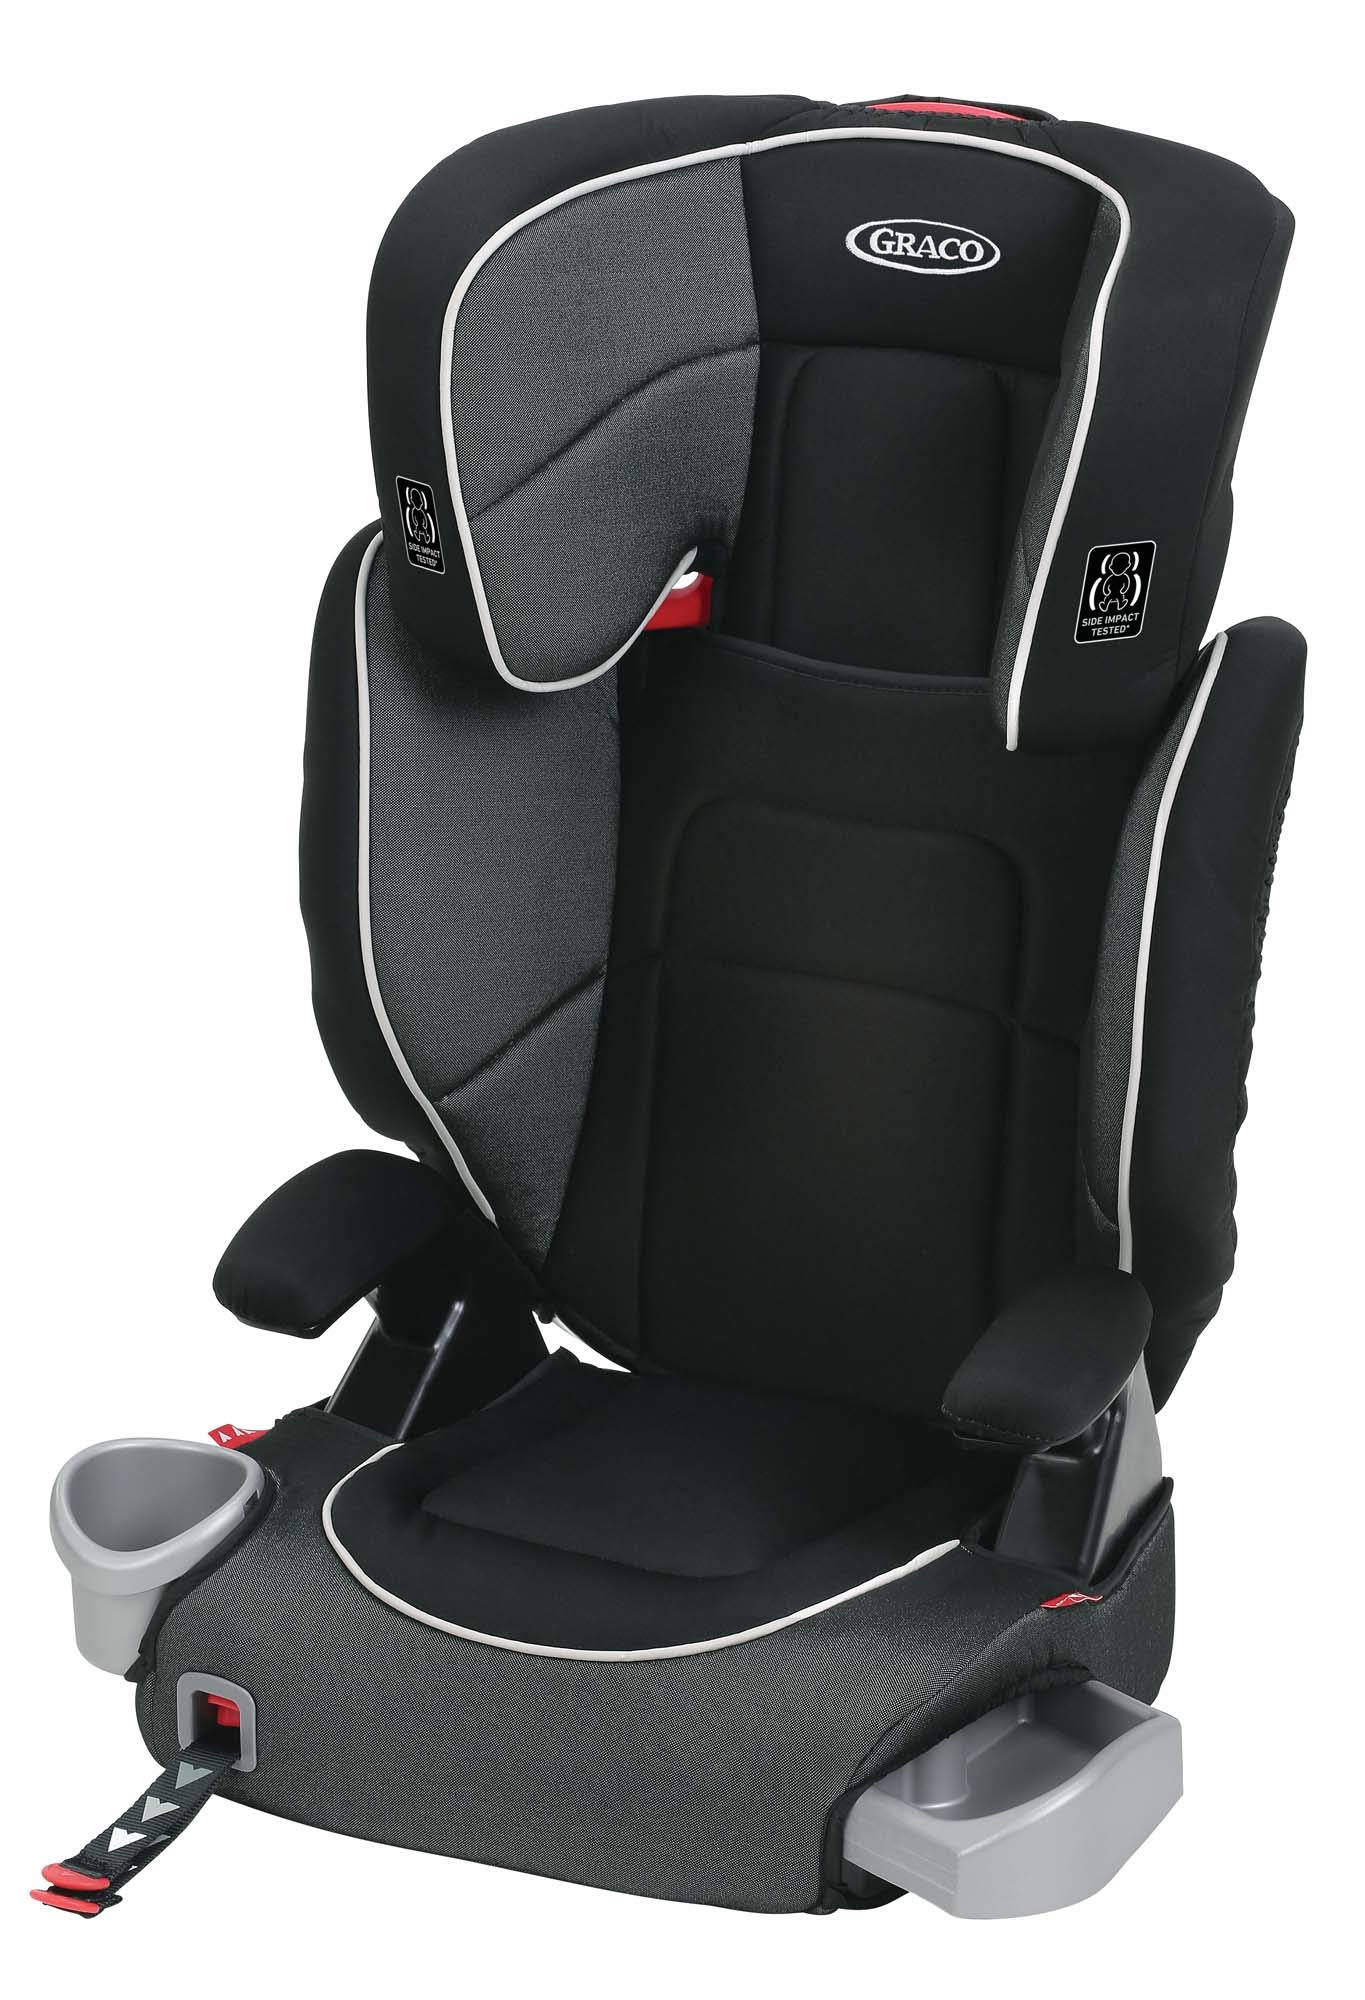 Graco Highback TurboBooster Elite Car Seat, Tuscan